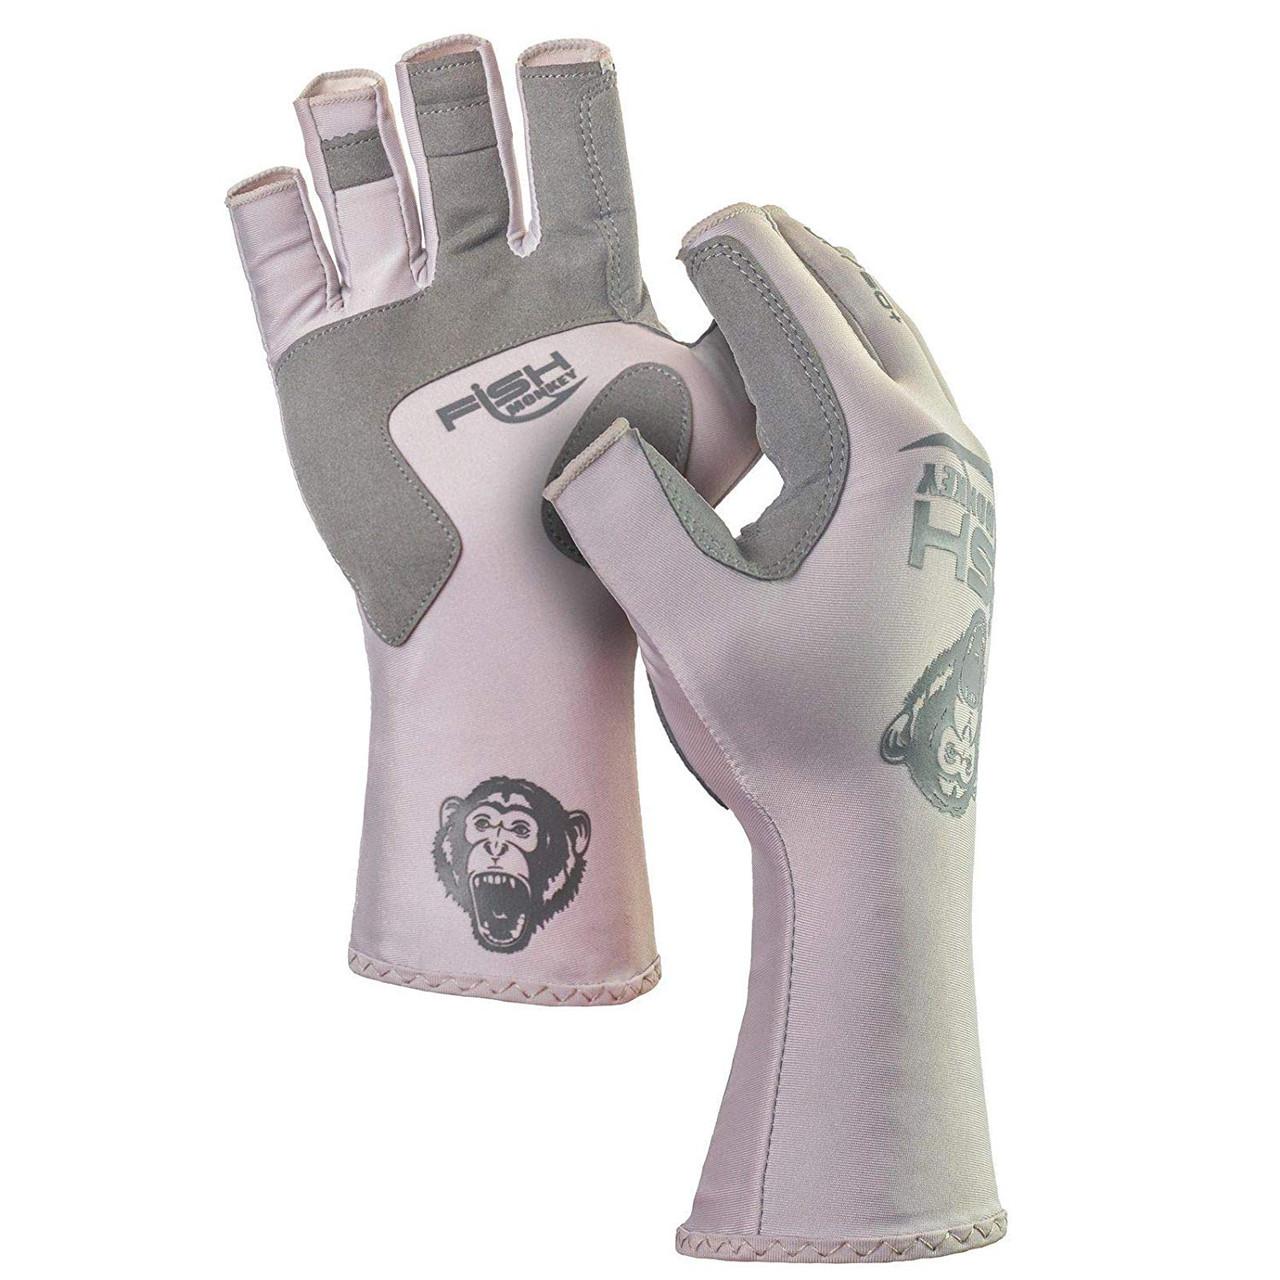 Fish Monkey Gloves Half Finger Guide Glove, Light Grey, MD - FM11-LTGREY-M